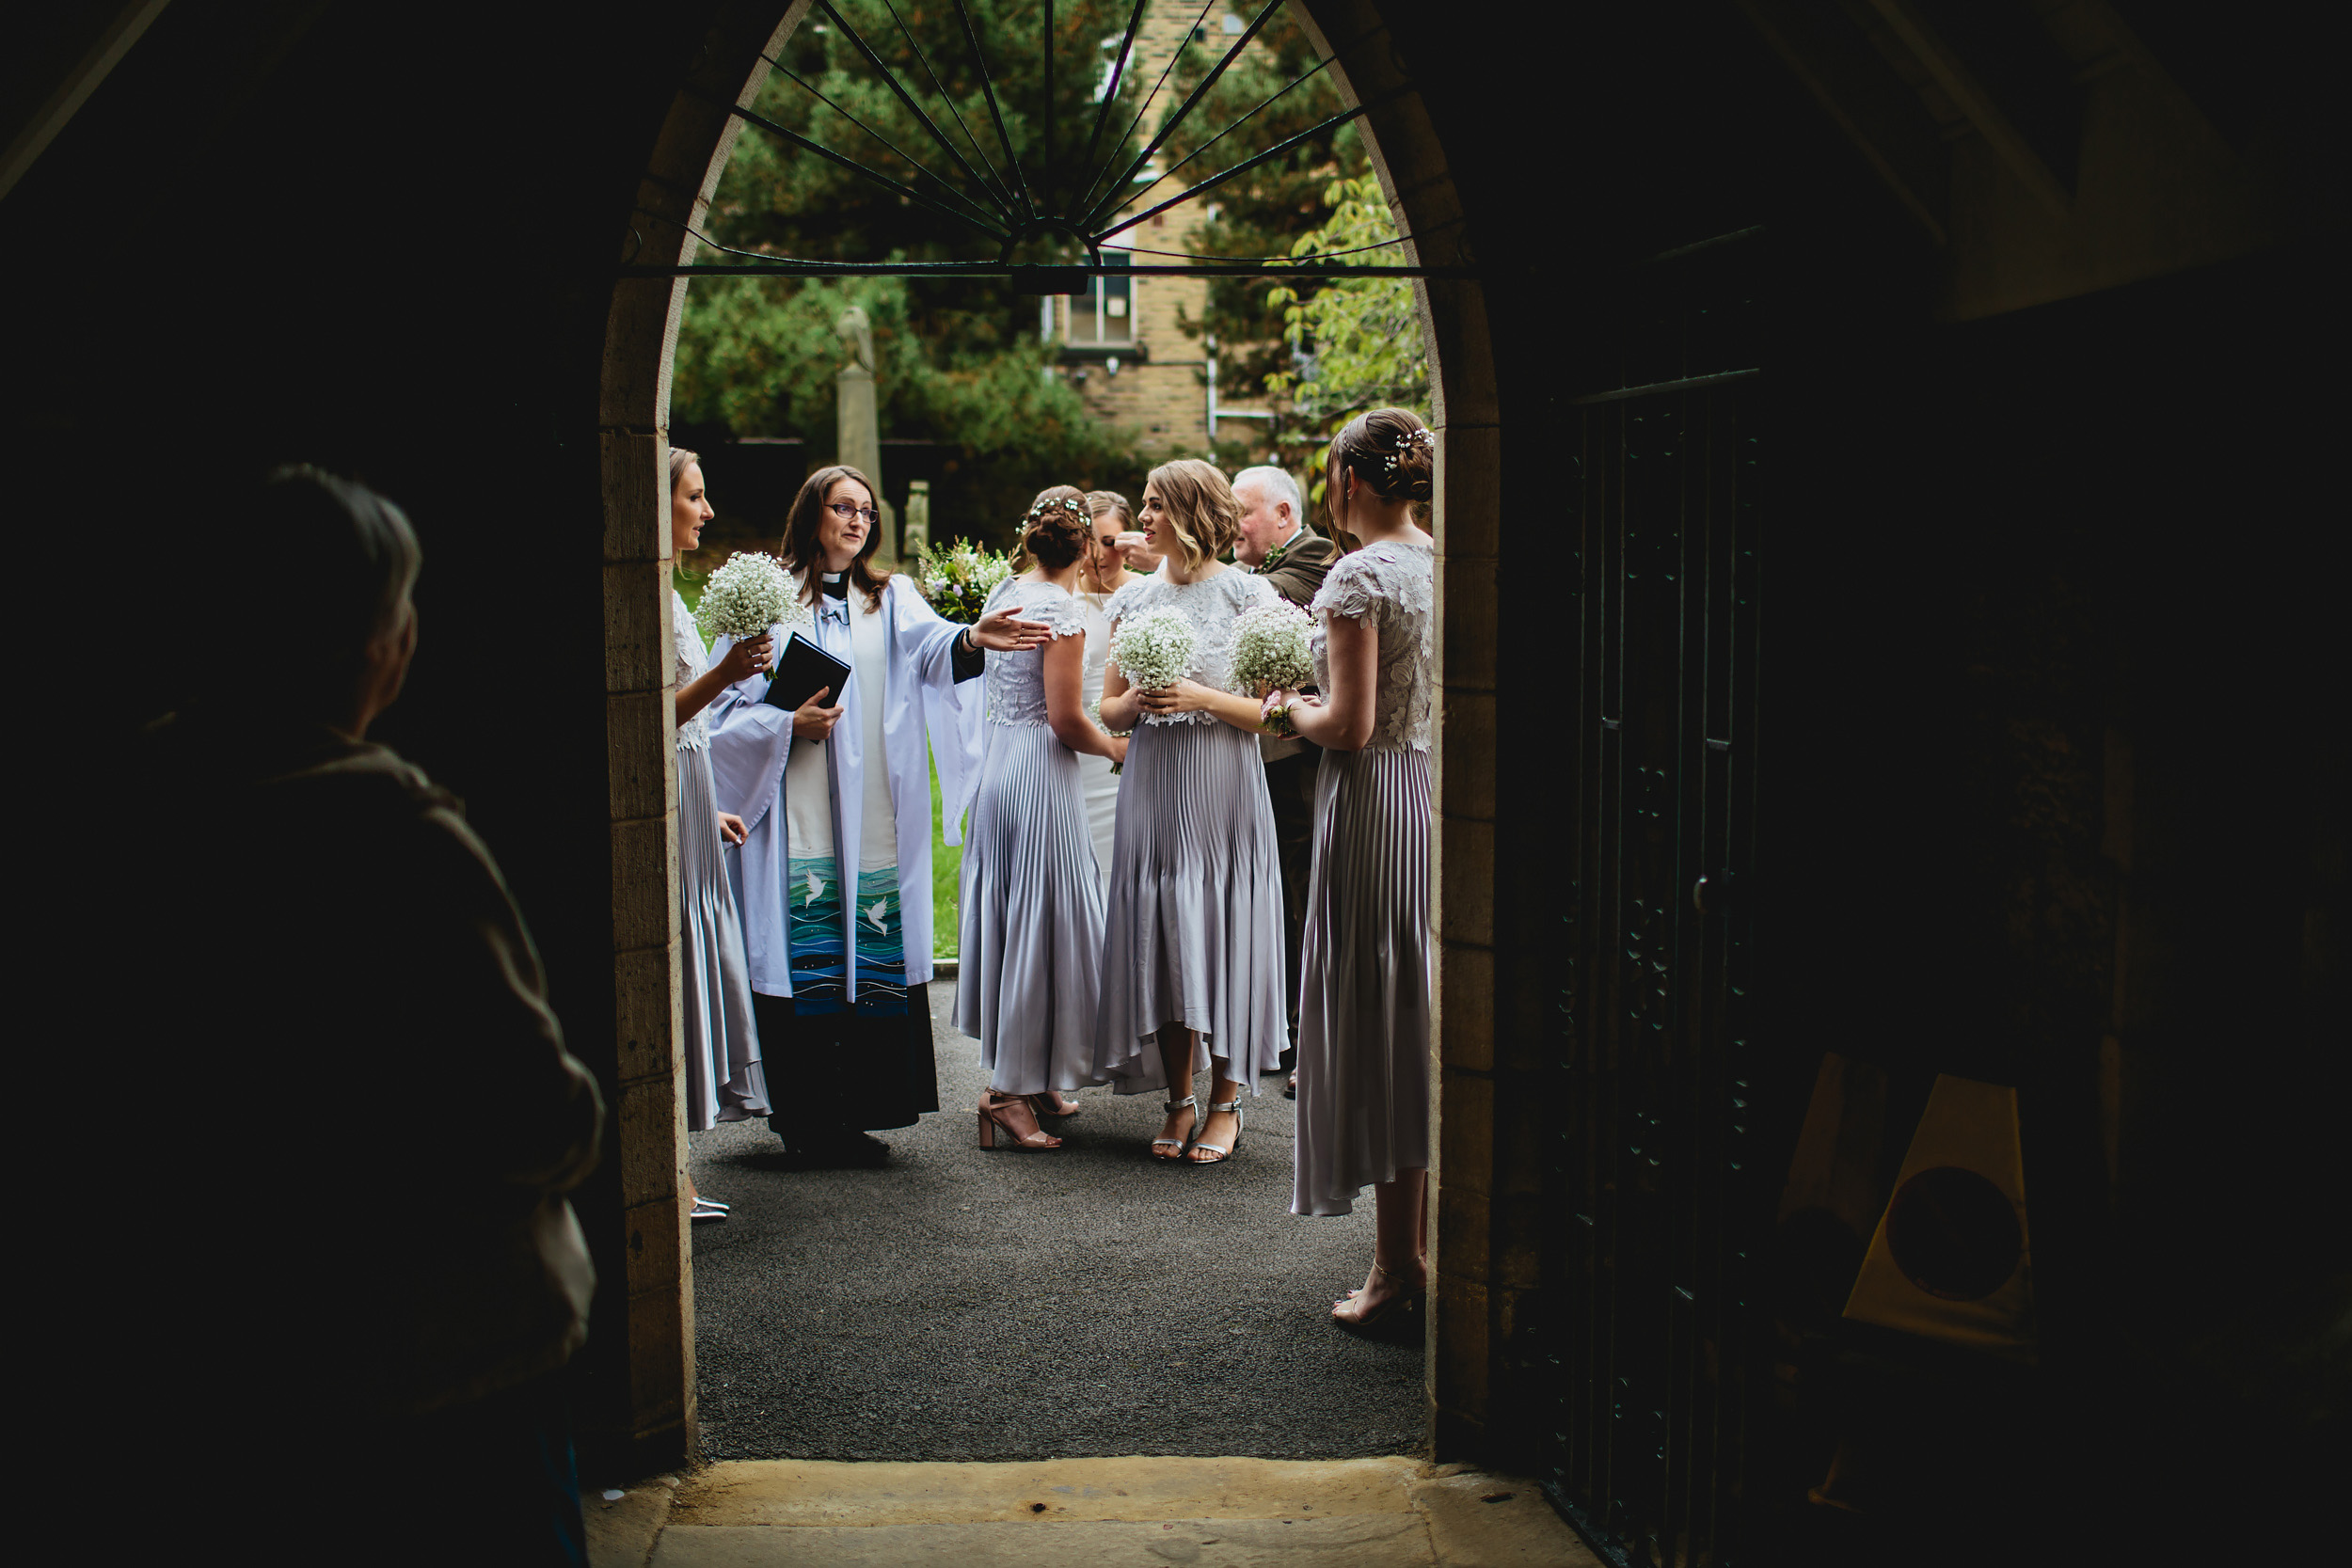 Vicar ushers bridesmaids into the church wedding